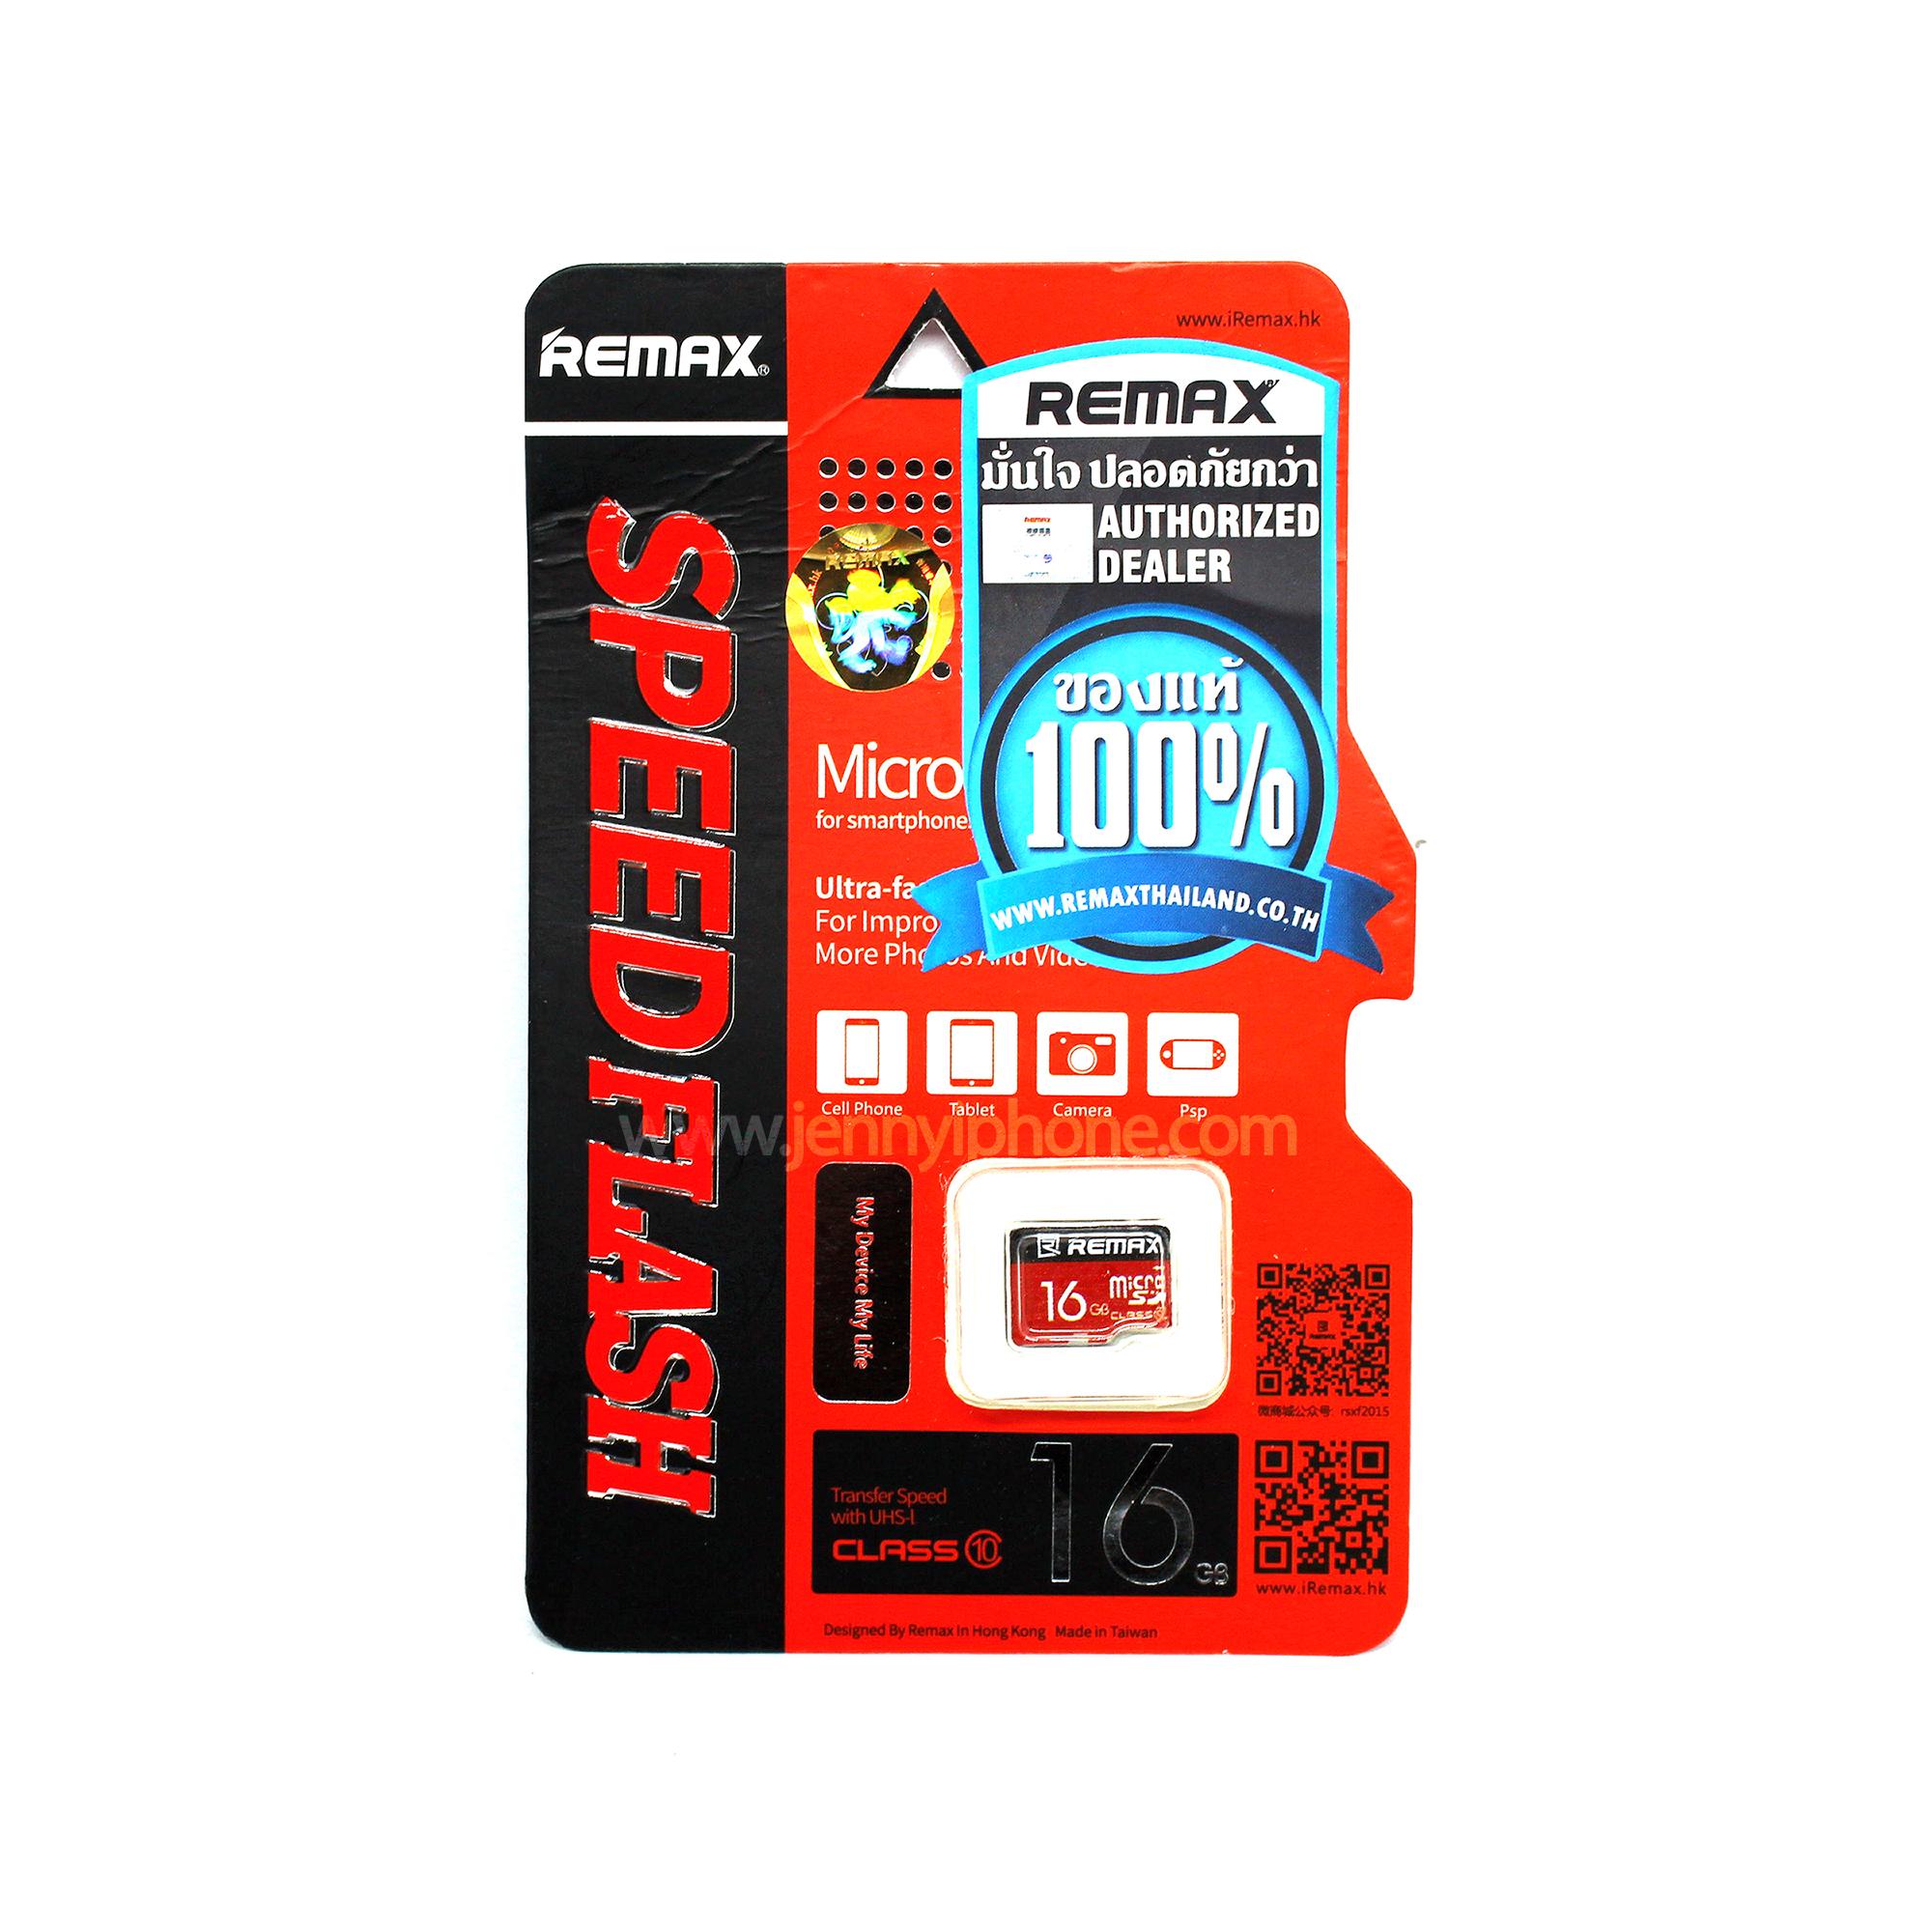 Remax Speed flash MicroSD Card 16 GB Red Class10